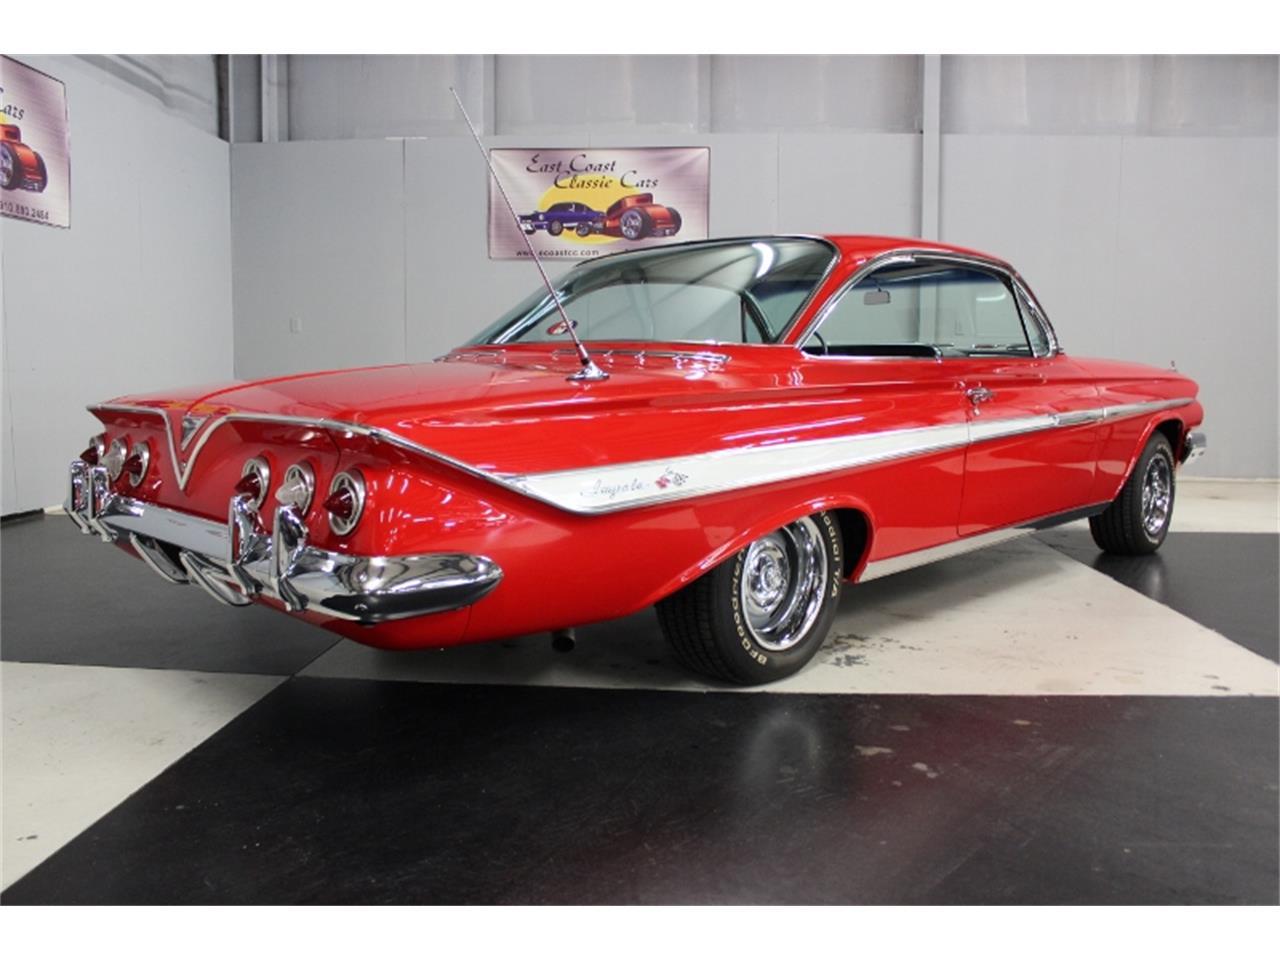 Large Picture of '61 Chevrolet Impala located in Lillington North Carolina - $58,000.00 - J60W